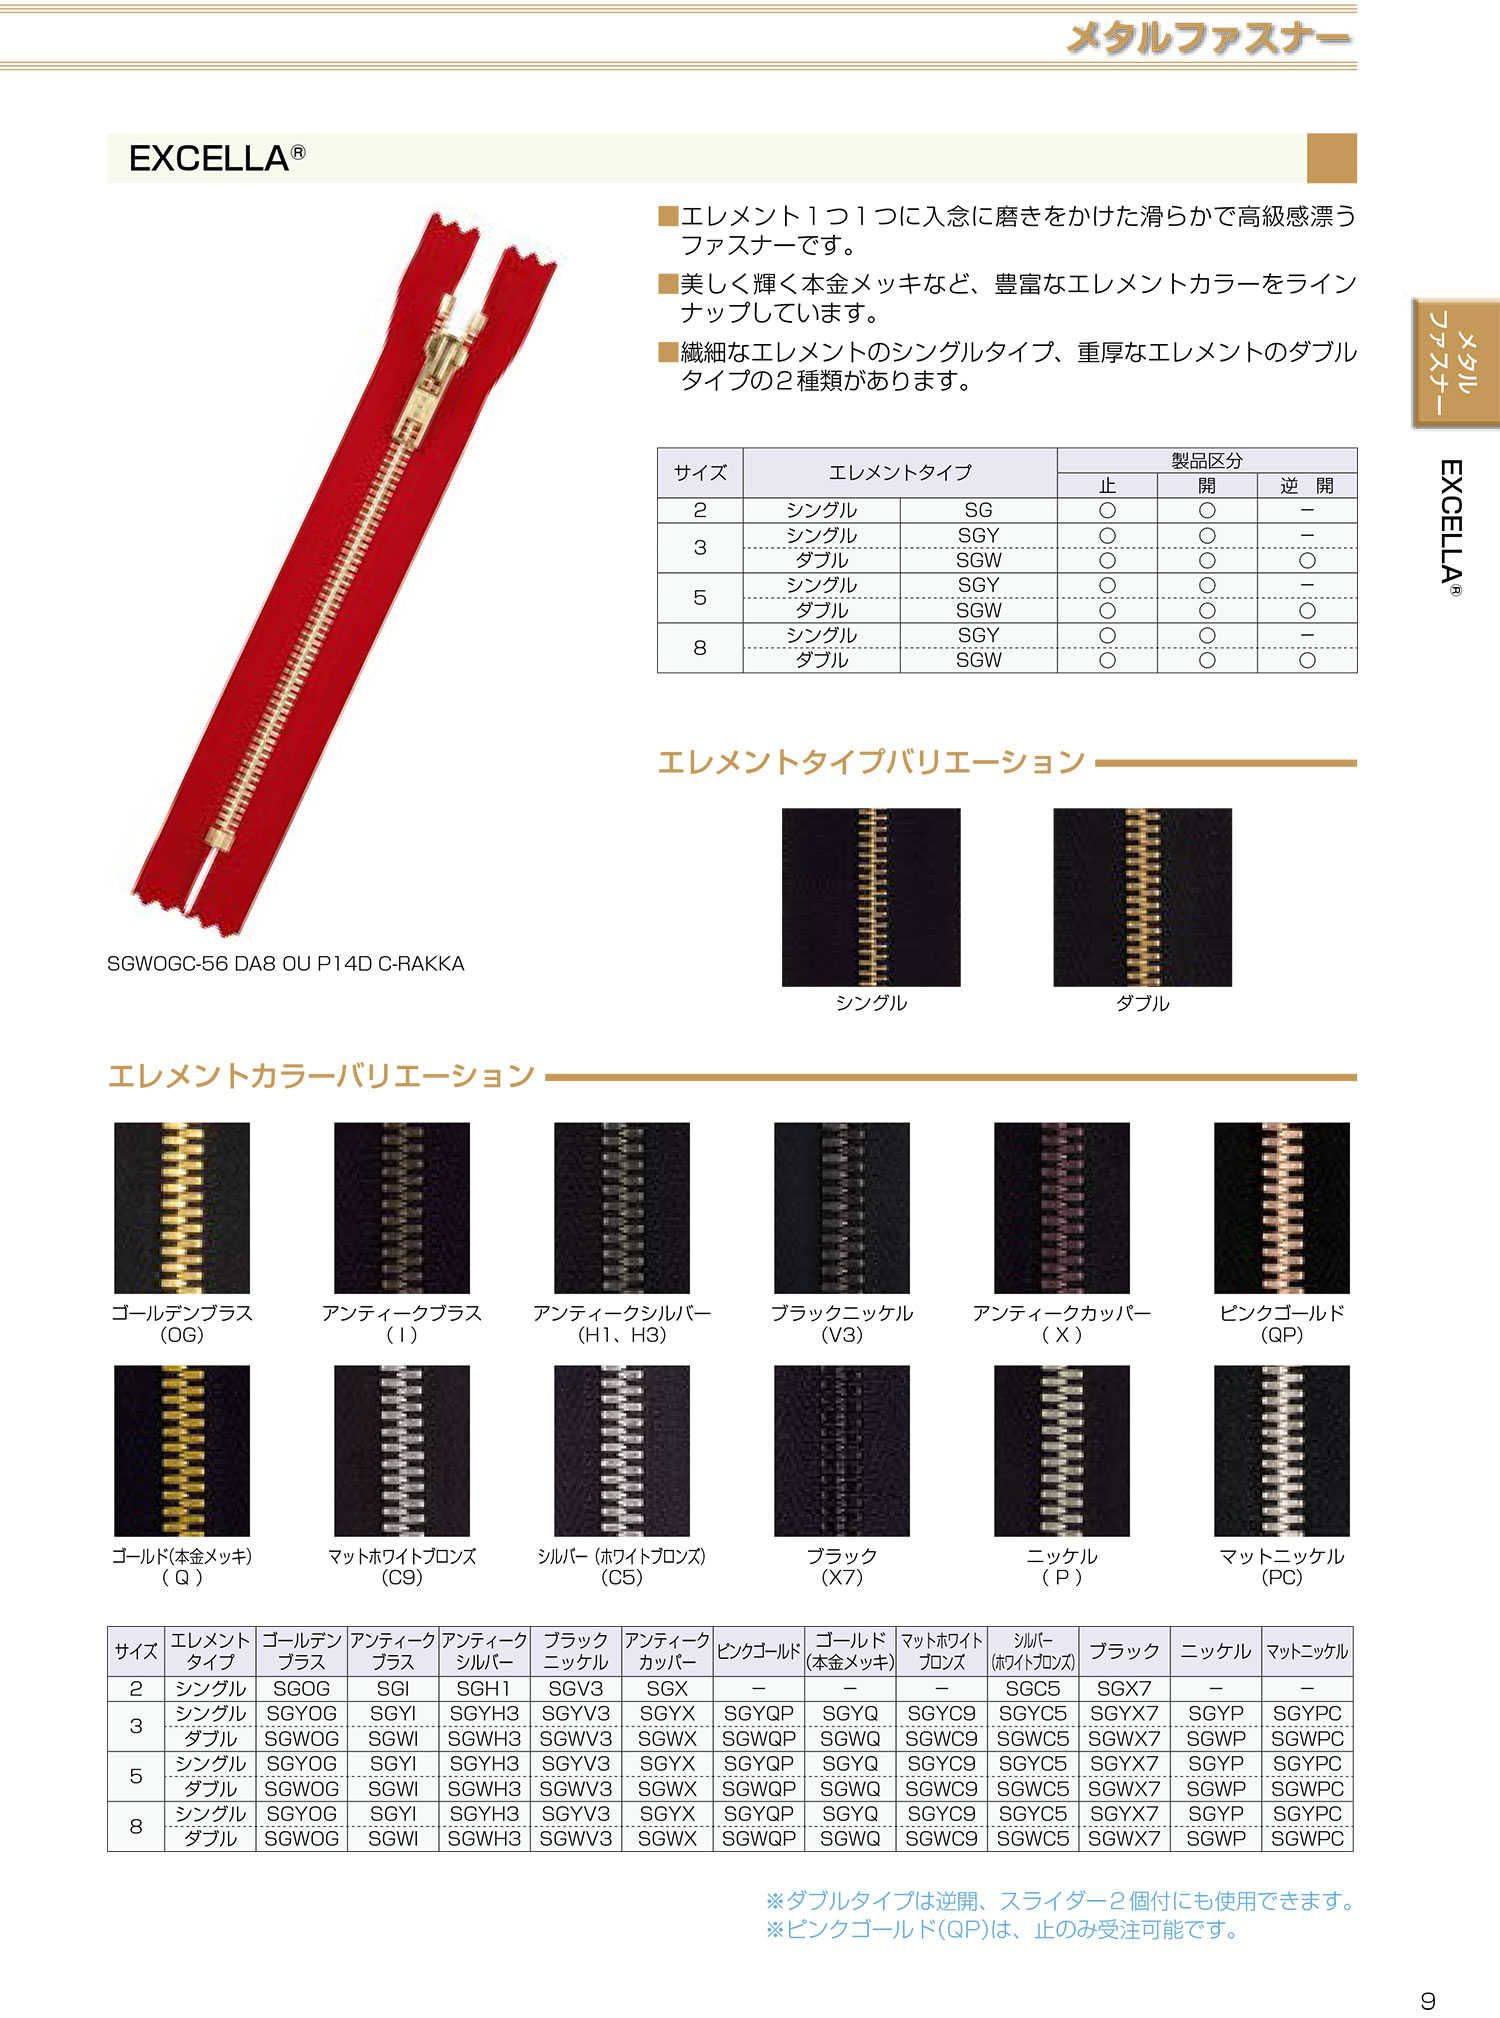 2SGV3OR エクセラ 2サイズ ブラックニッケル オープン シングル[ファスナー] YKK/オークラ商事 - ApparelX アパレル資材卸通販